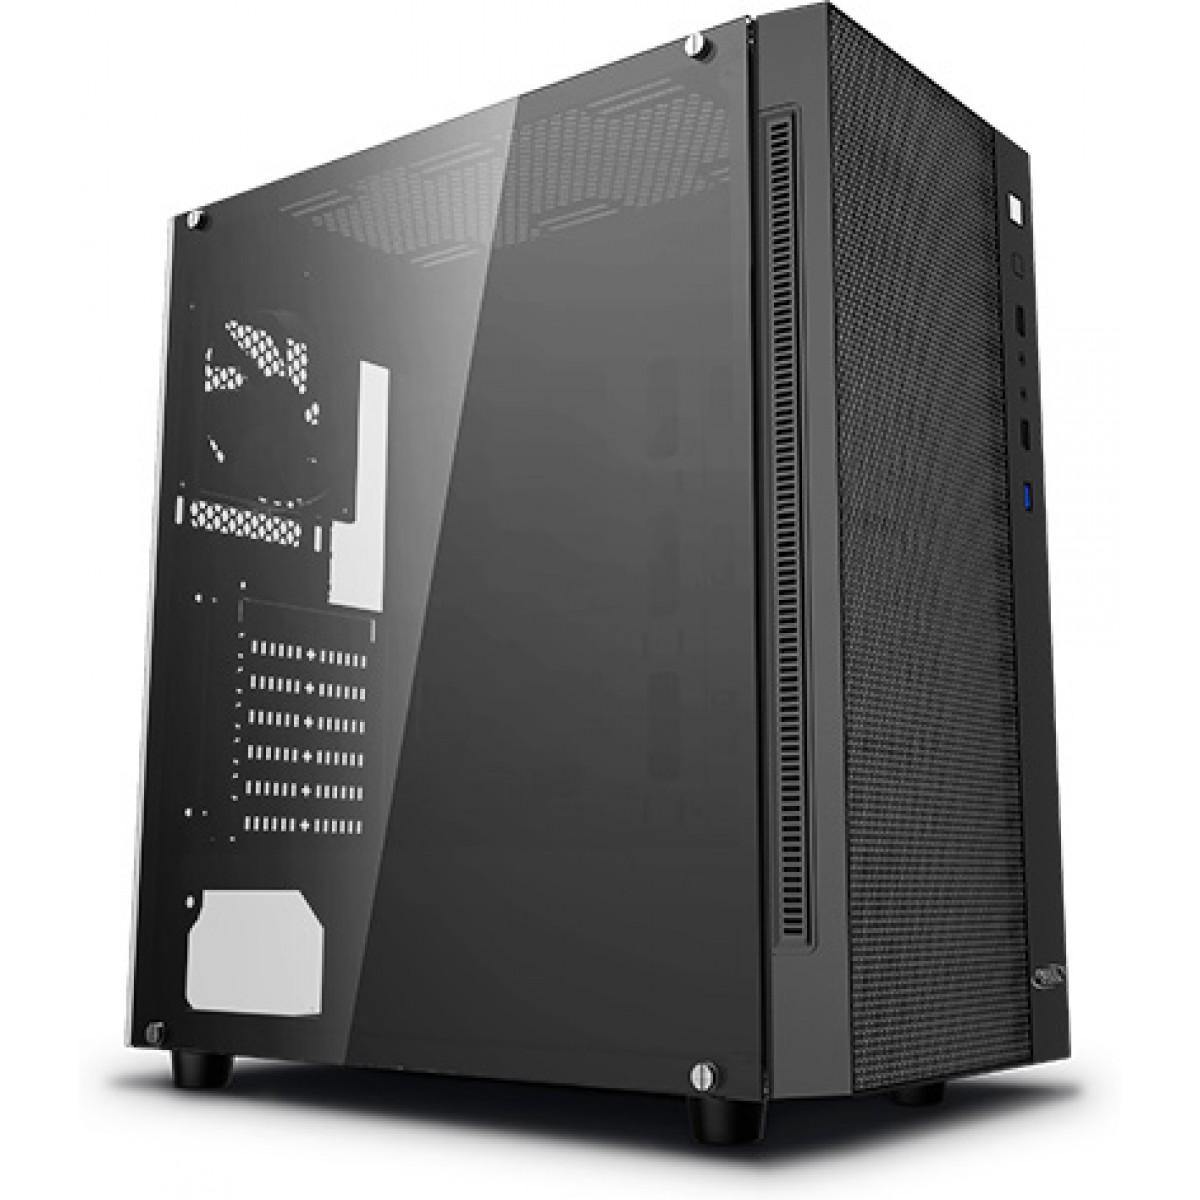 Gabinete Gamer DeepCool Matrexx 55 Mesh, Mid Tower, Vidro temperado, Black, Sem Fonte, Sem Fan, DP-ATX-MATREXX55-MESH